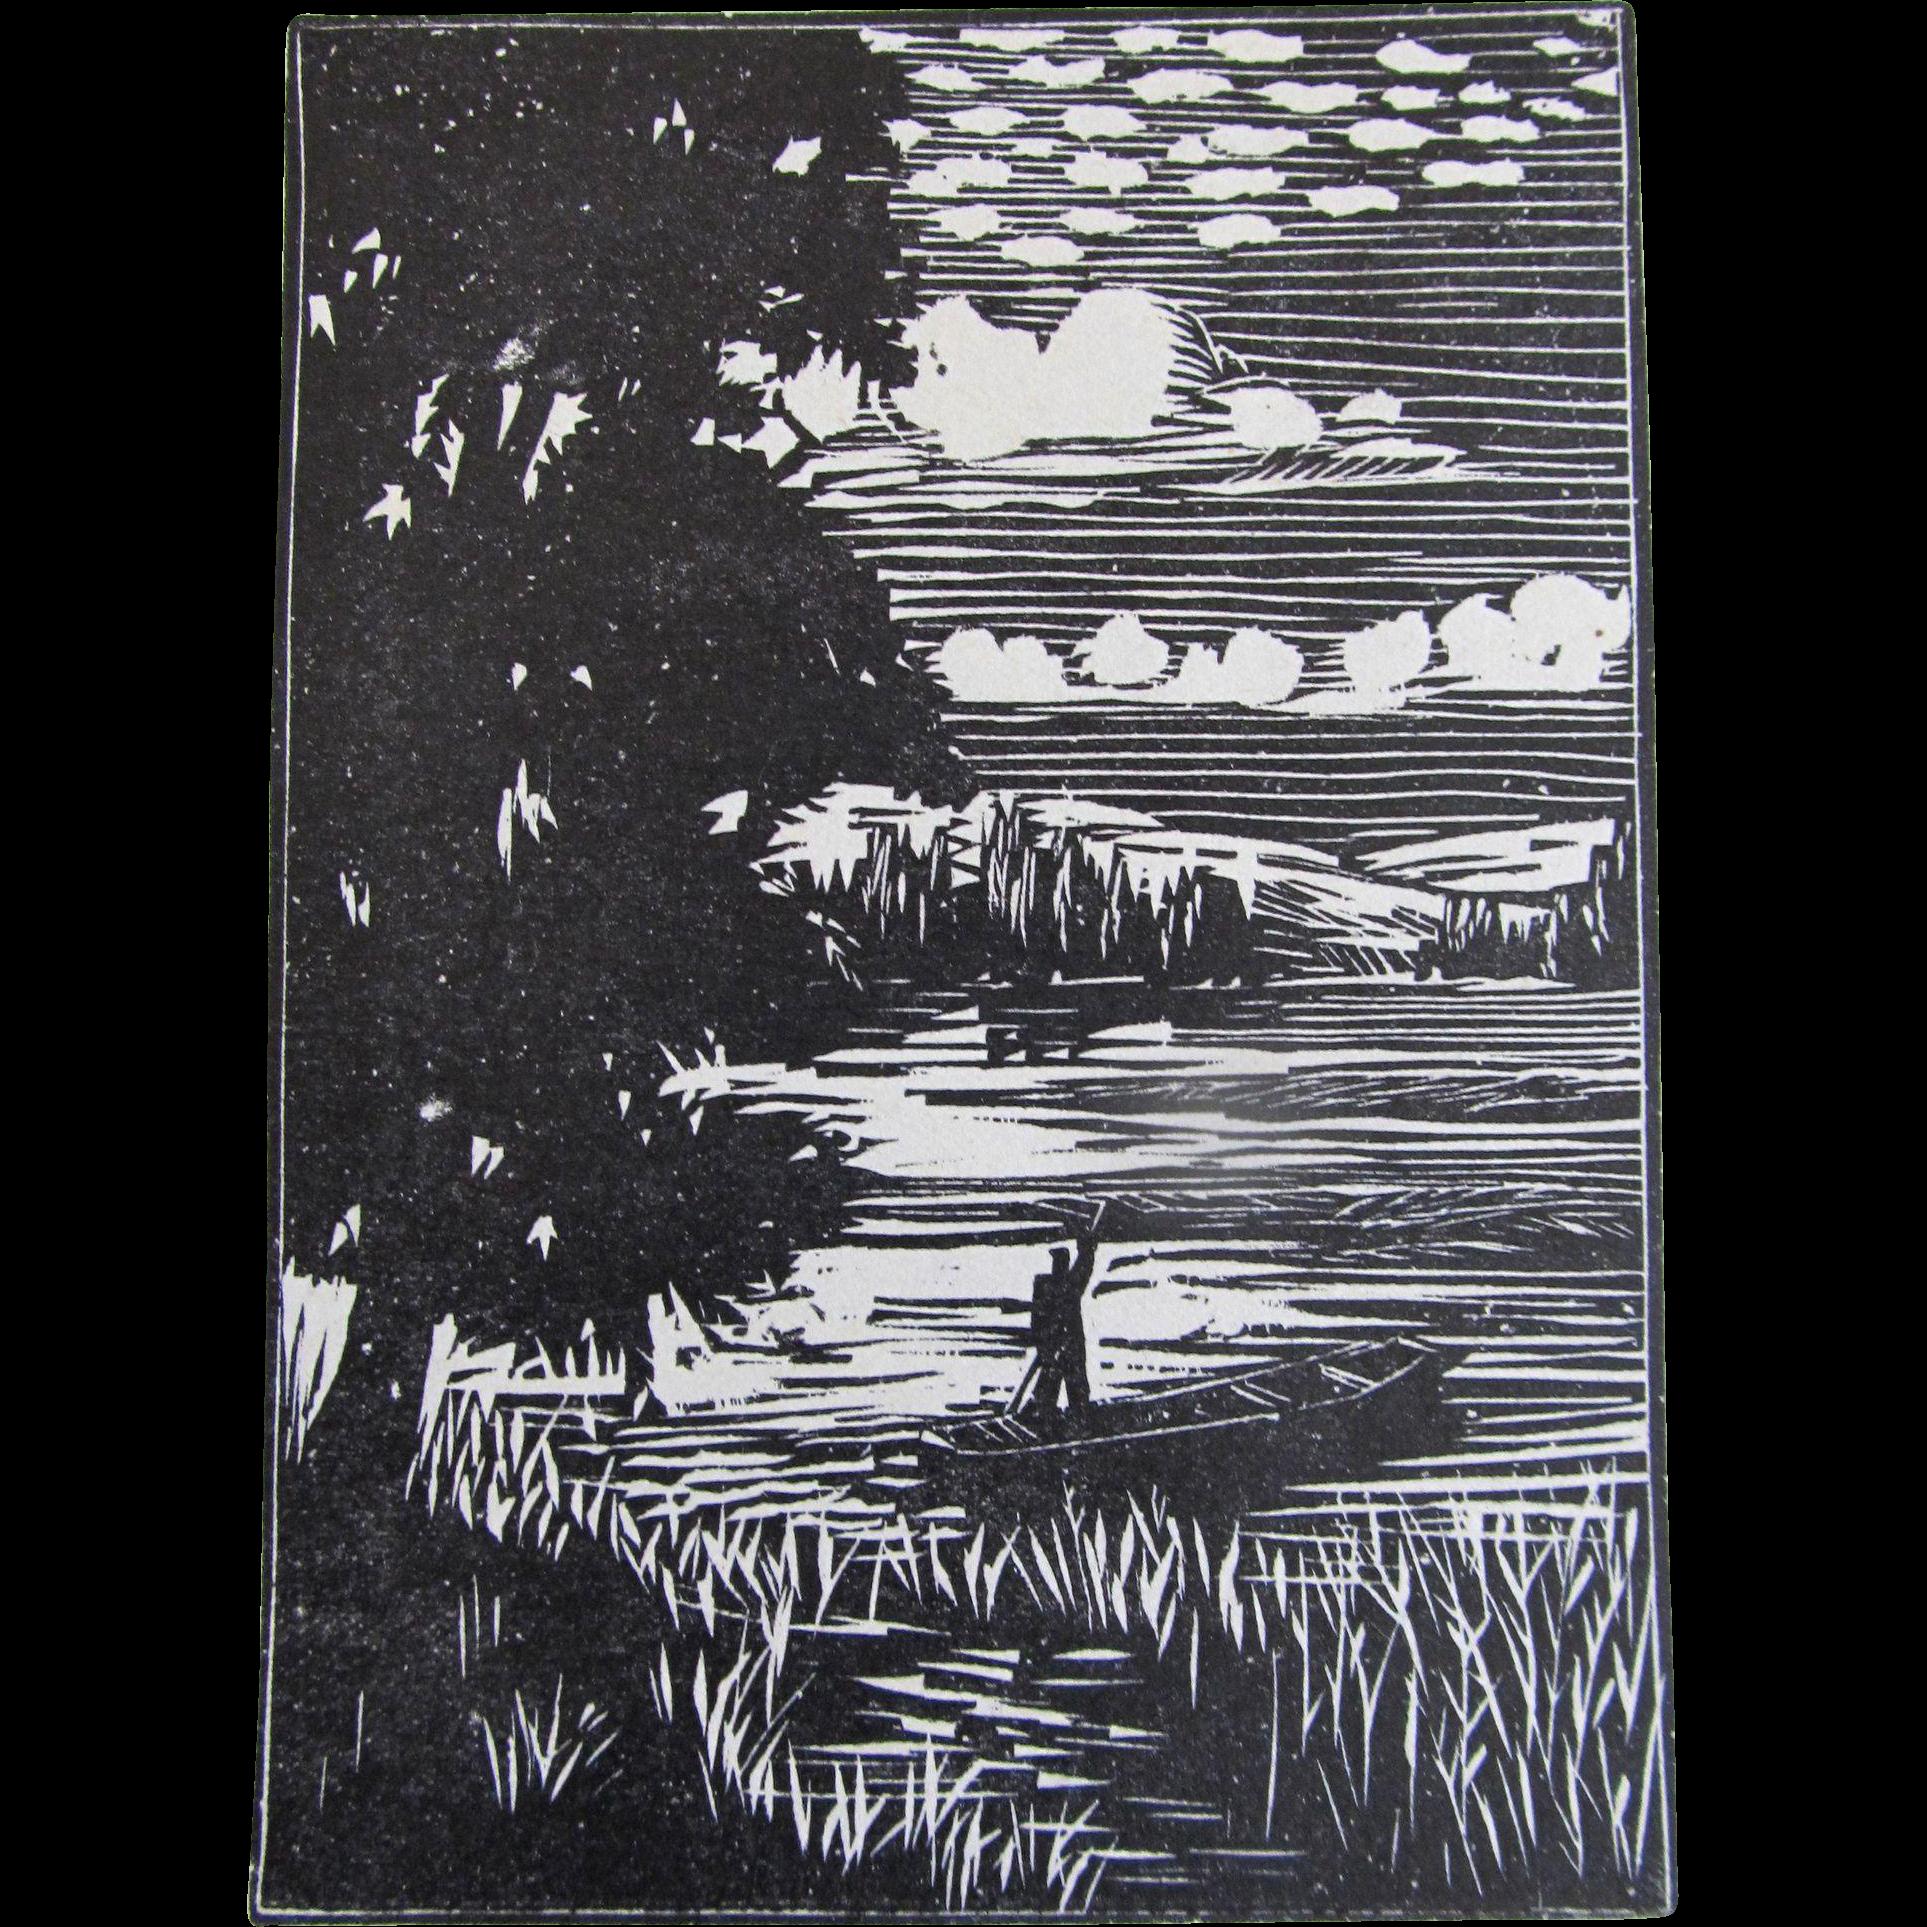 Vintage French Art DECO Print Woodcut 20s DROUART 2 LISTED Artist!